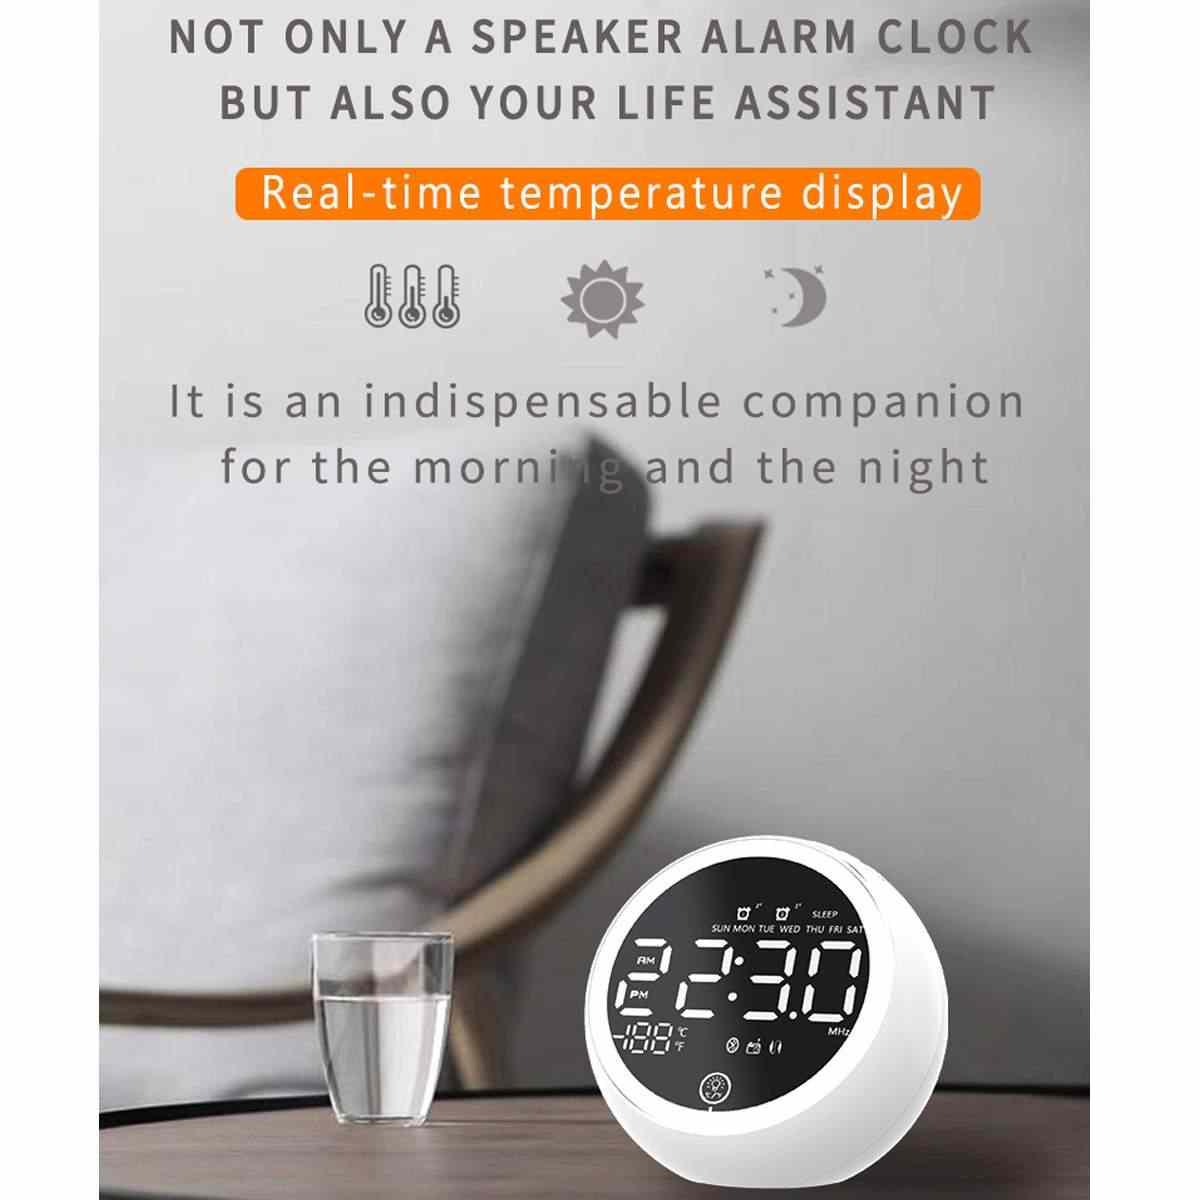 EU Plug Digital Alarm Clock Radio bluetooth Speaker white Digit Display FM radio with Ambient Light USB Port for phone charging